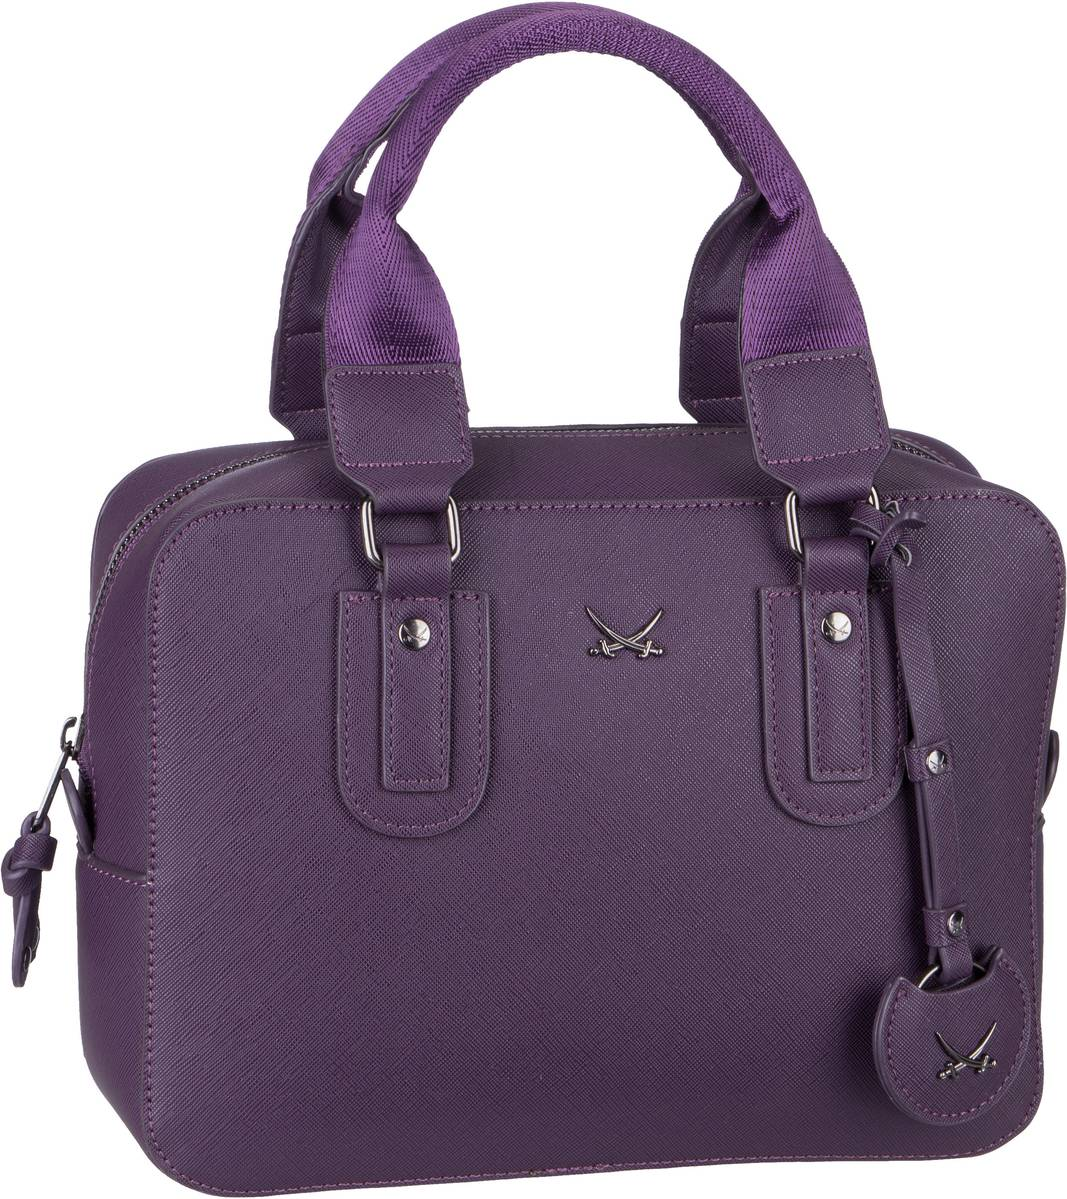 Handtasche Bowling Bag 1331 Aubergine